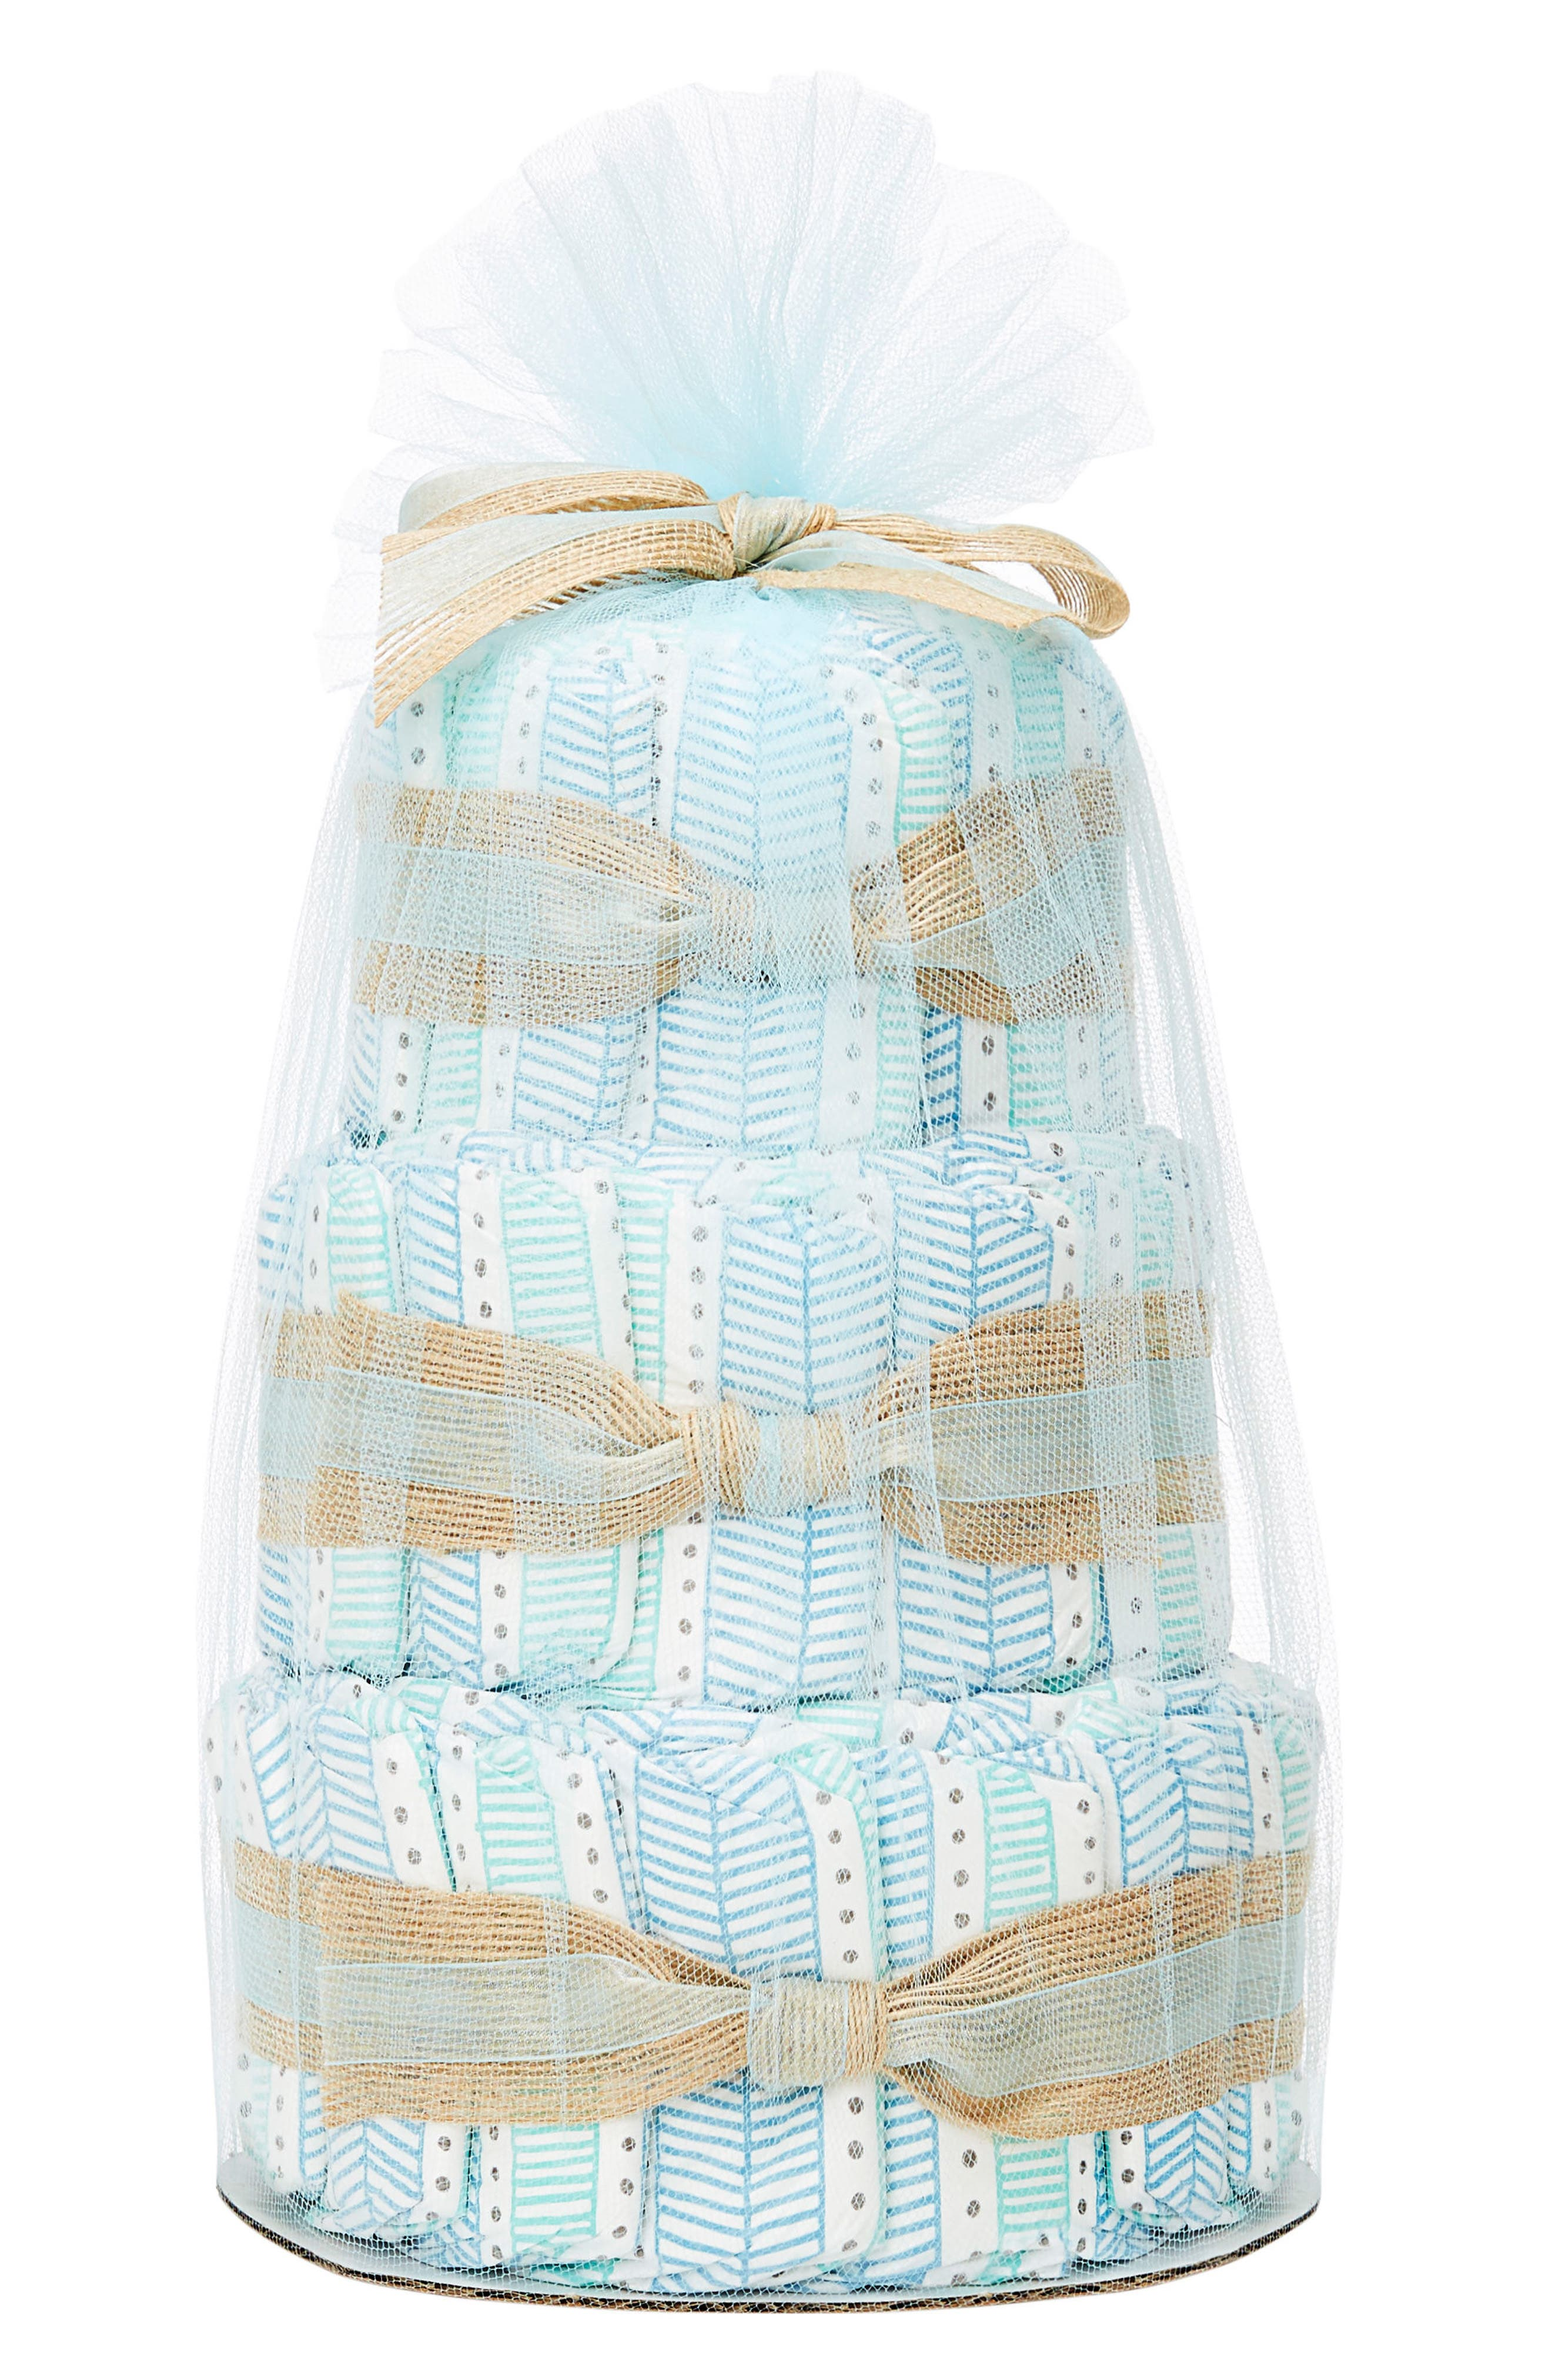 Mini Diaper Cake & Travel-Size Essentials Set,                         Main,                         color, Teal Tribal